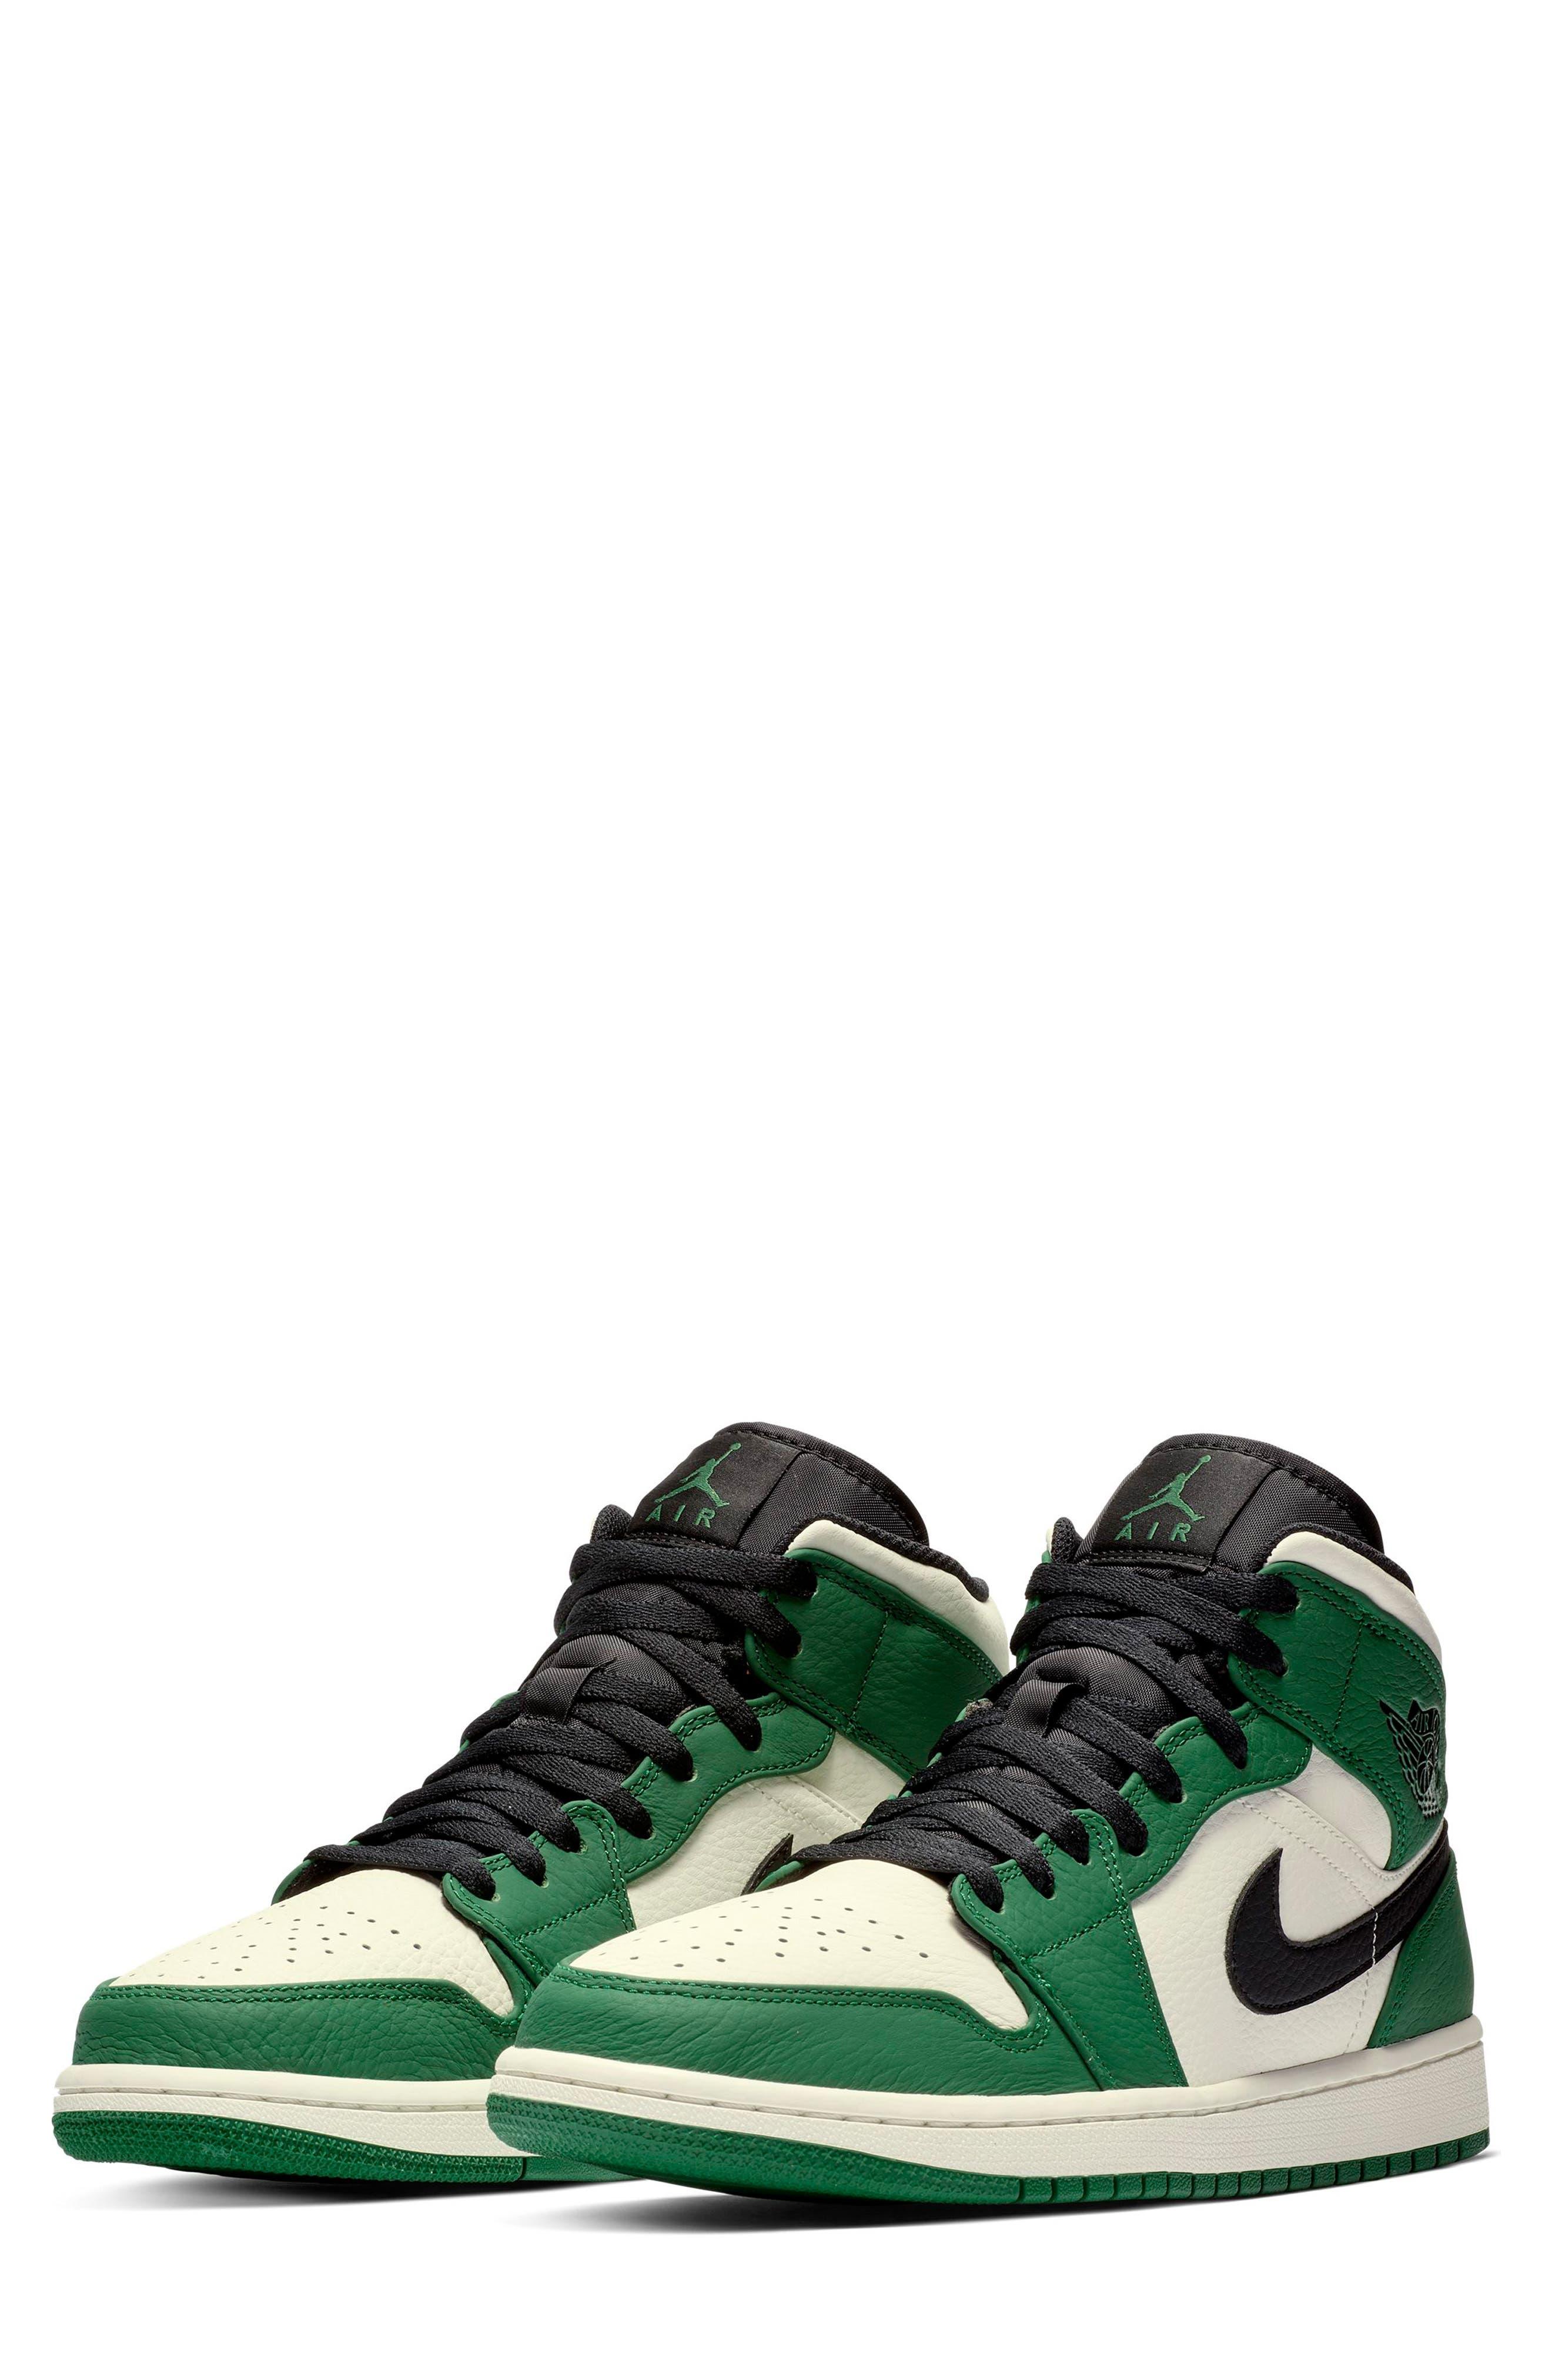 NIKE Air Jordan 1 Mid Winterized Sneaker, Main, color, 301